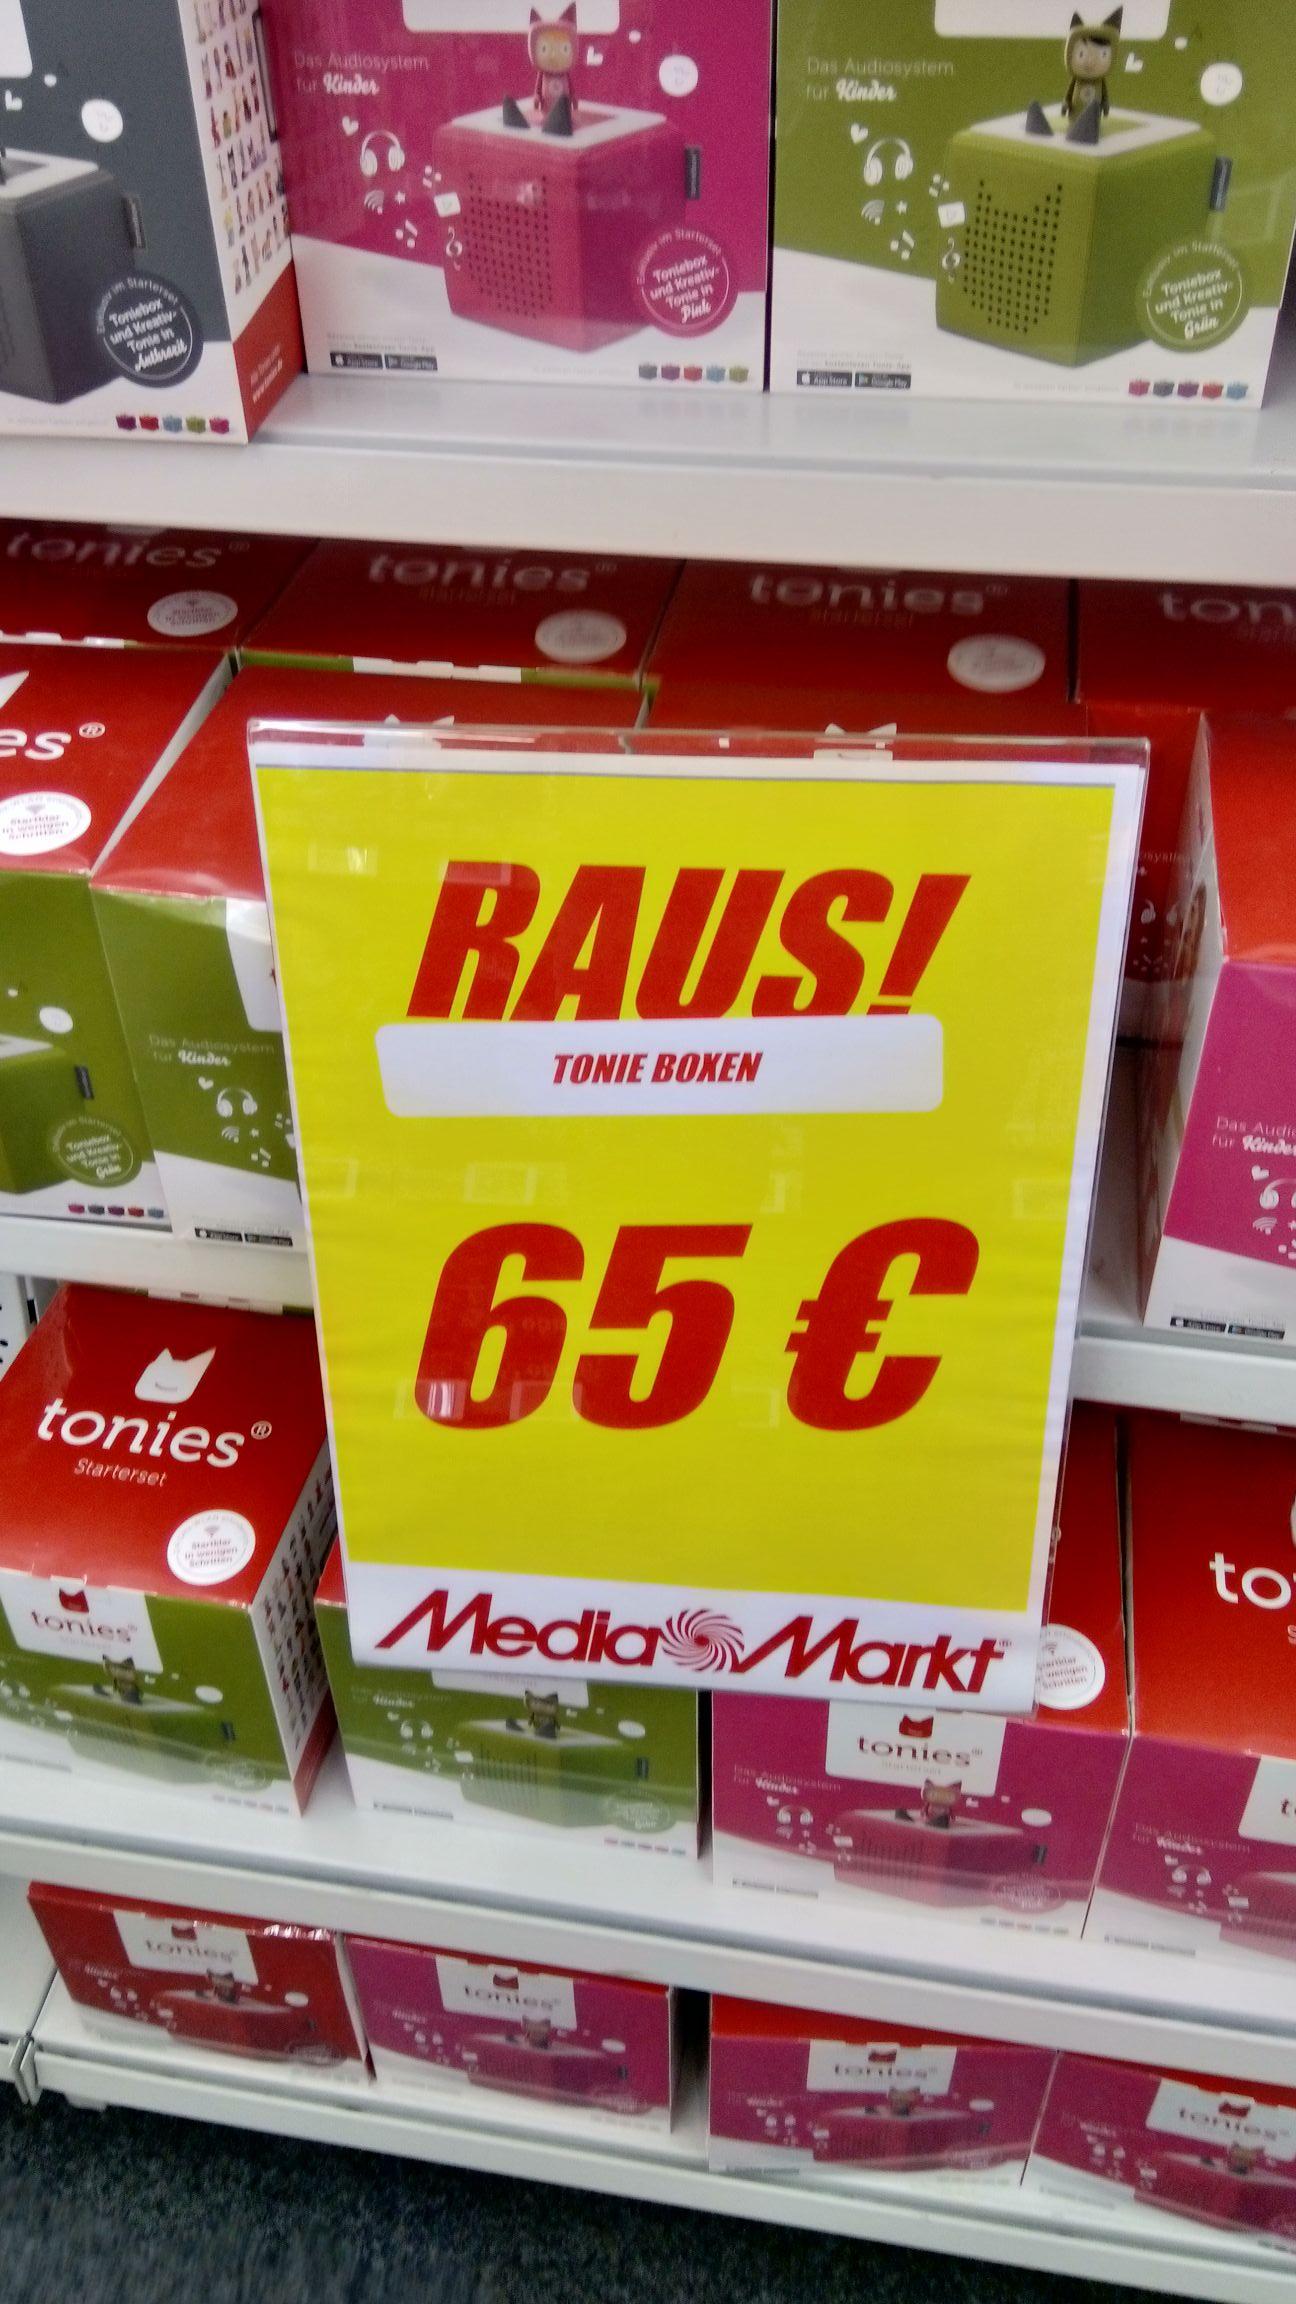 Tonies Toniebox - Media Markt Heidelberg  Rohrbach - [Lokal]